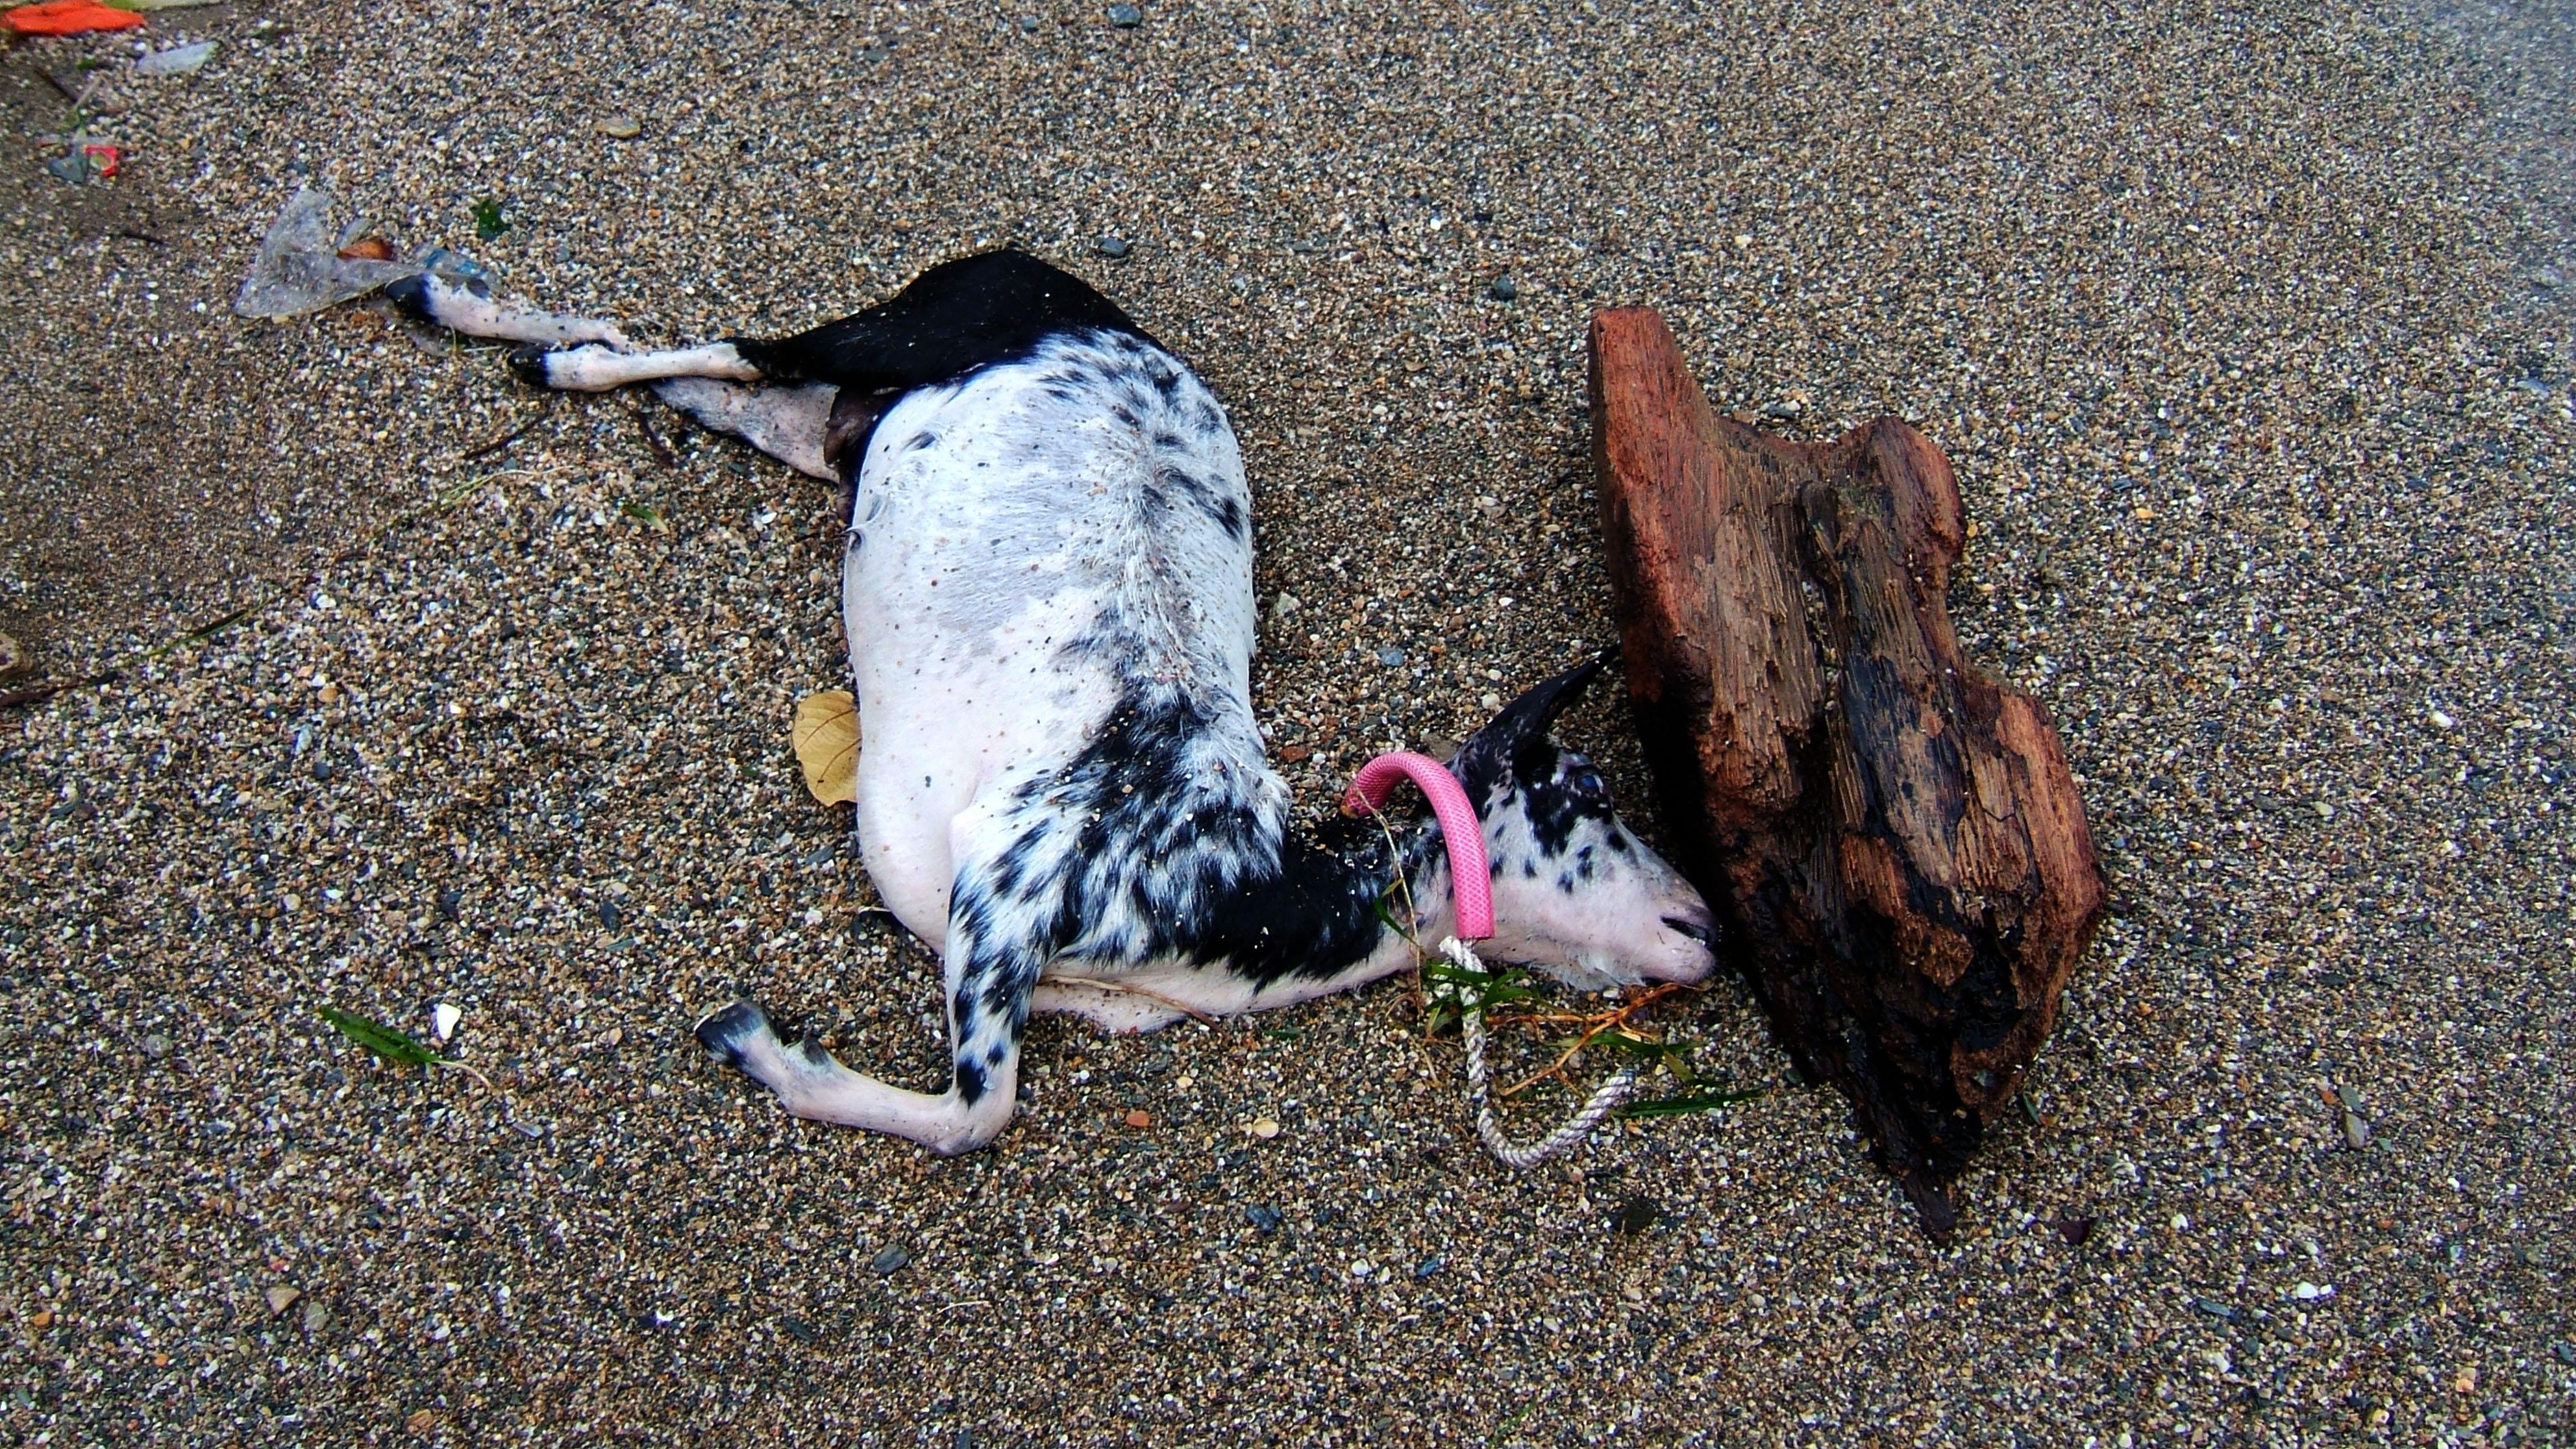 Goat drowned Mindoro Typhoon Chanchu Cat 2 01